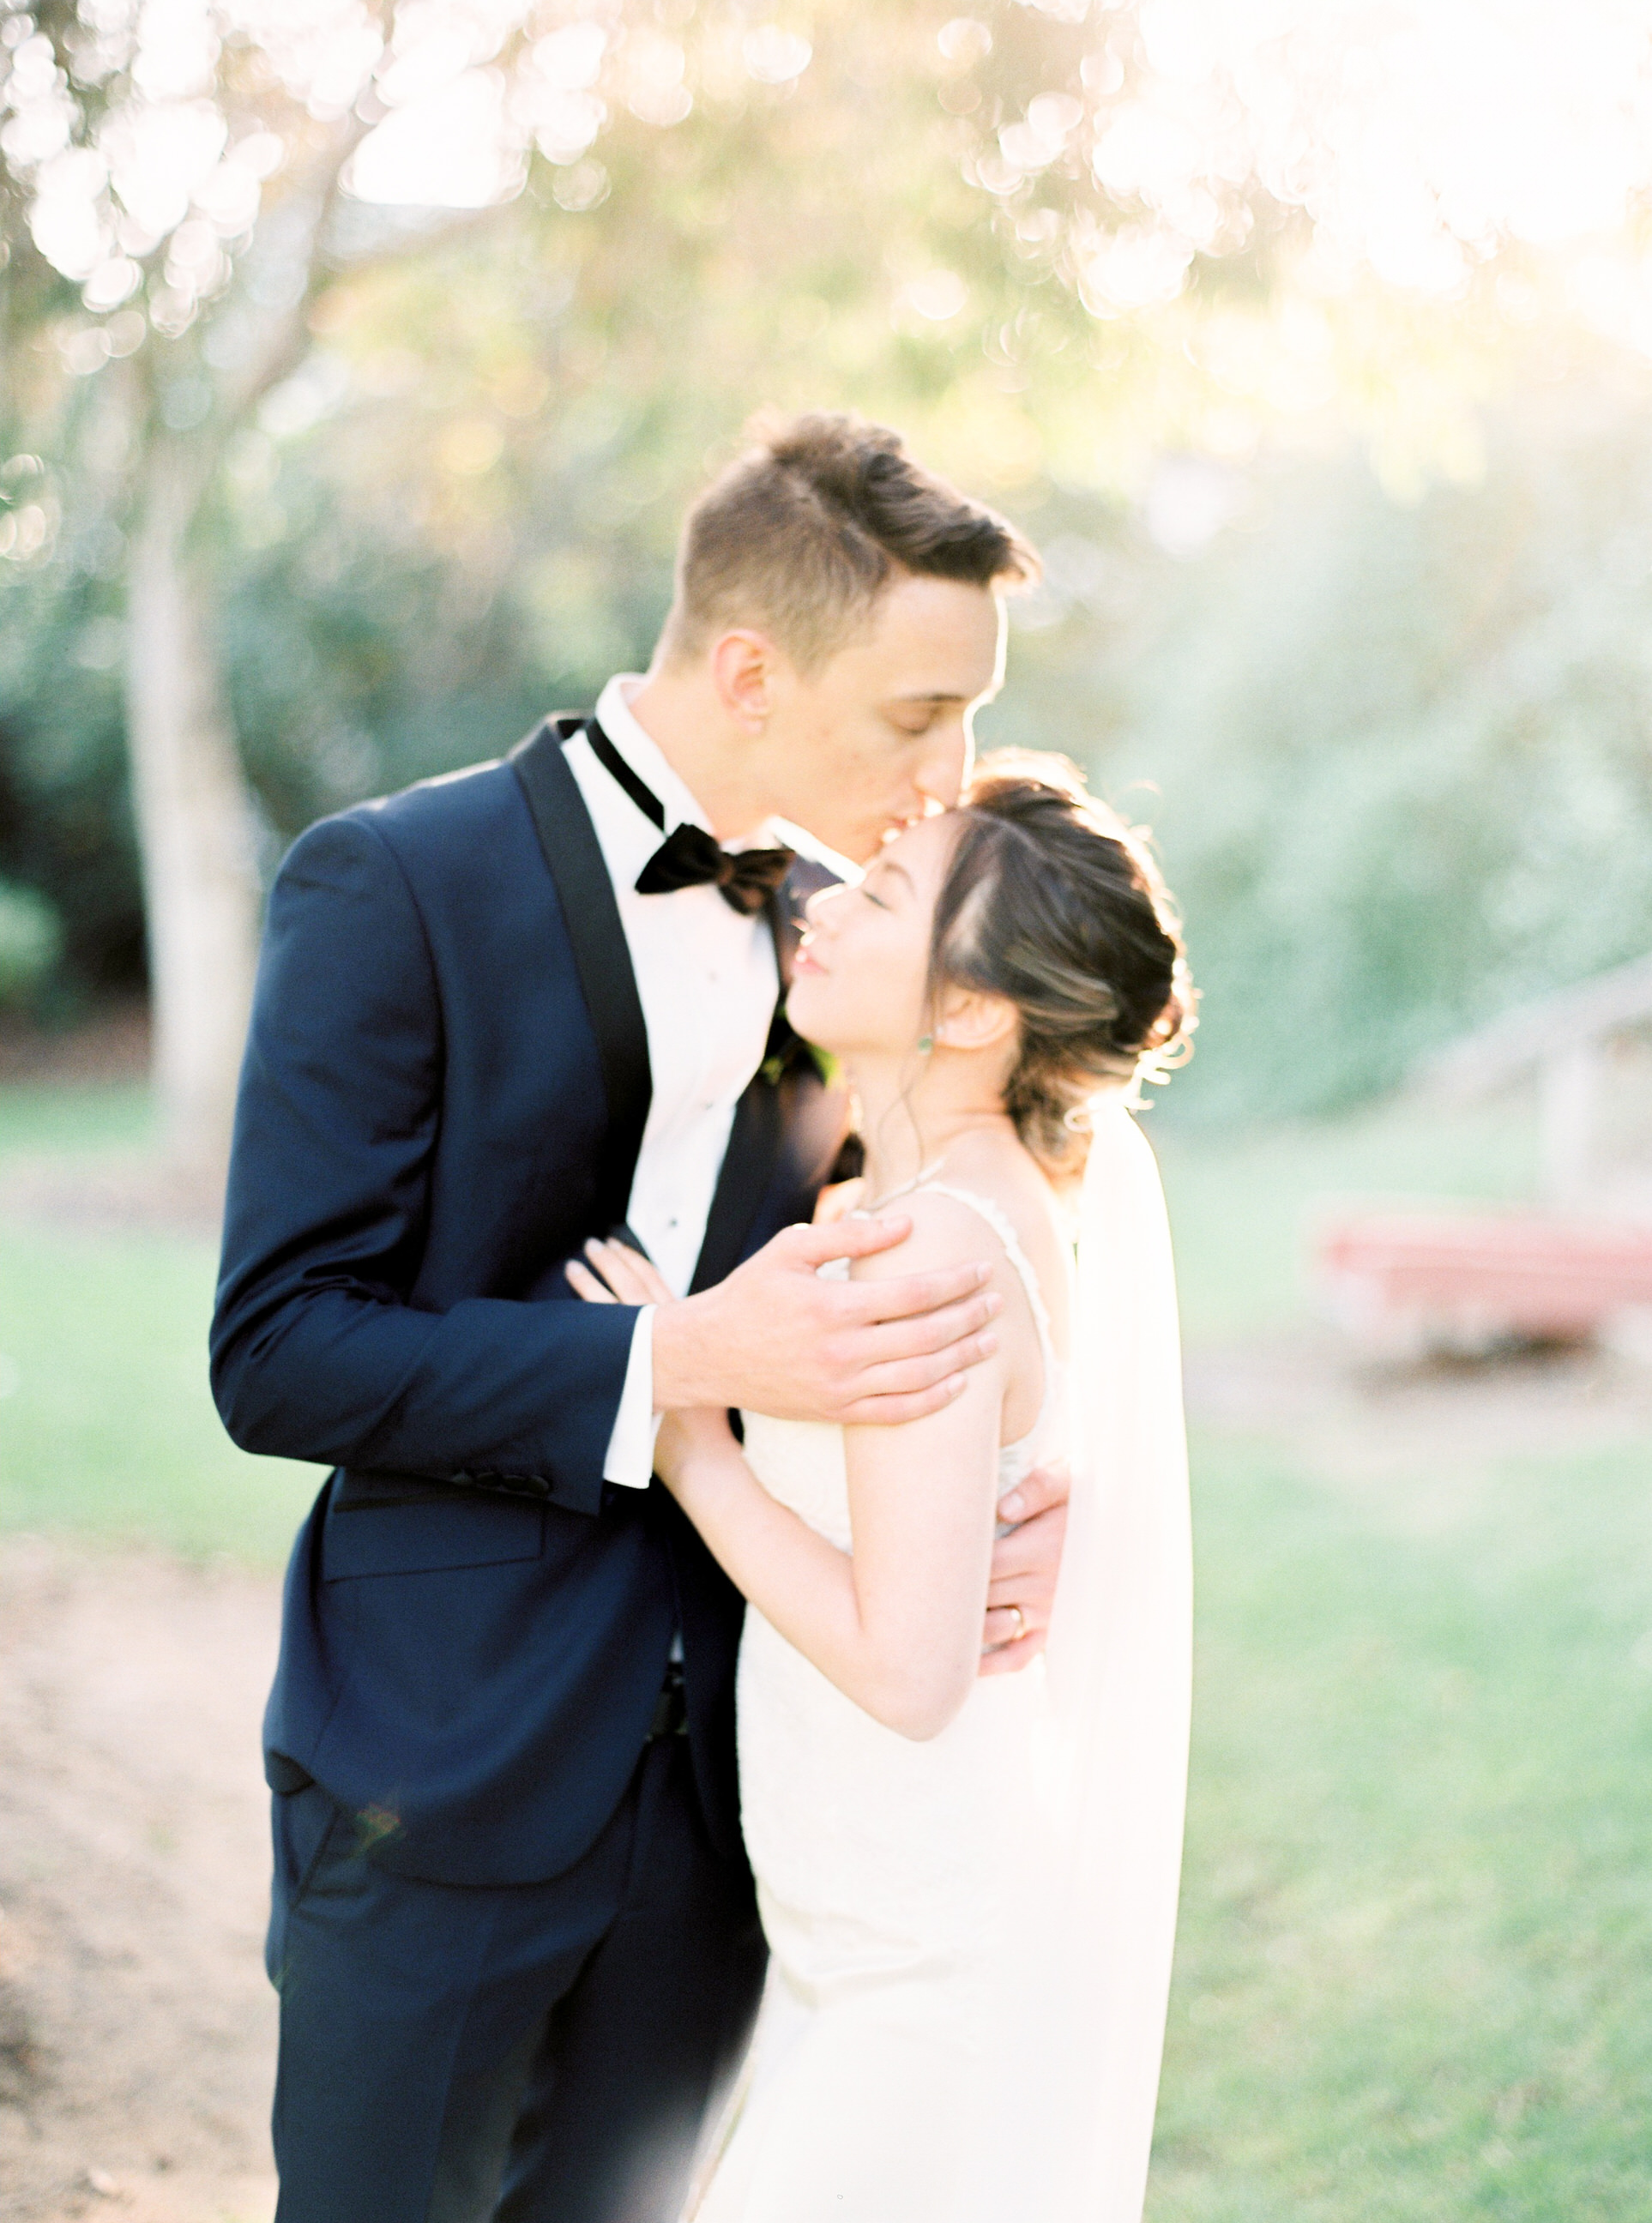 film wedding photography perth